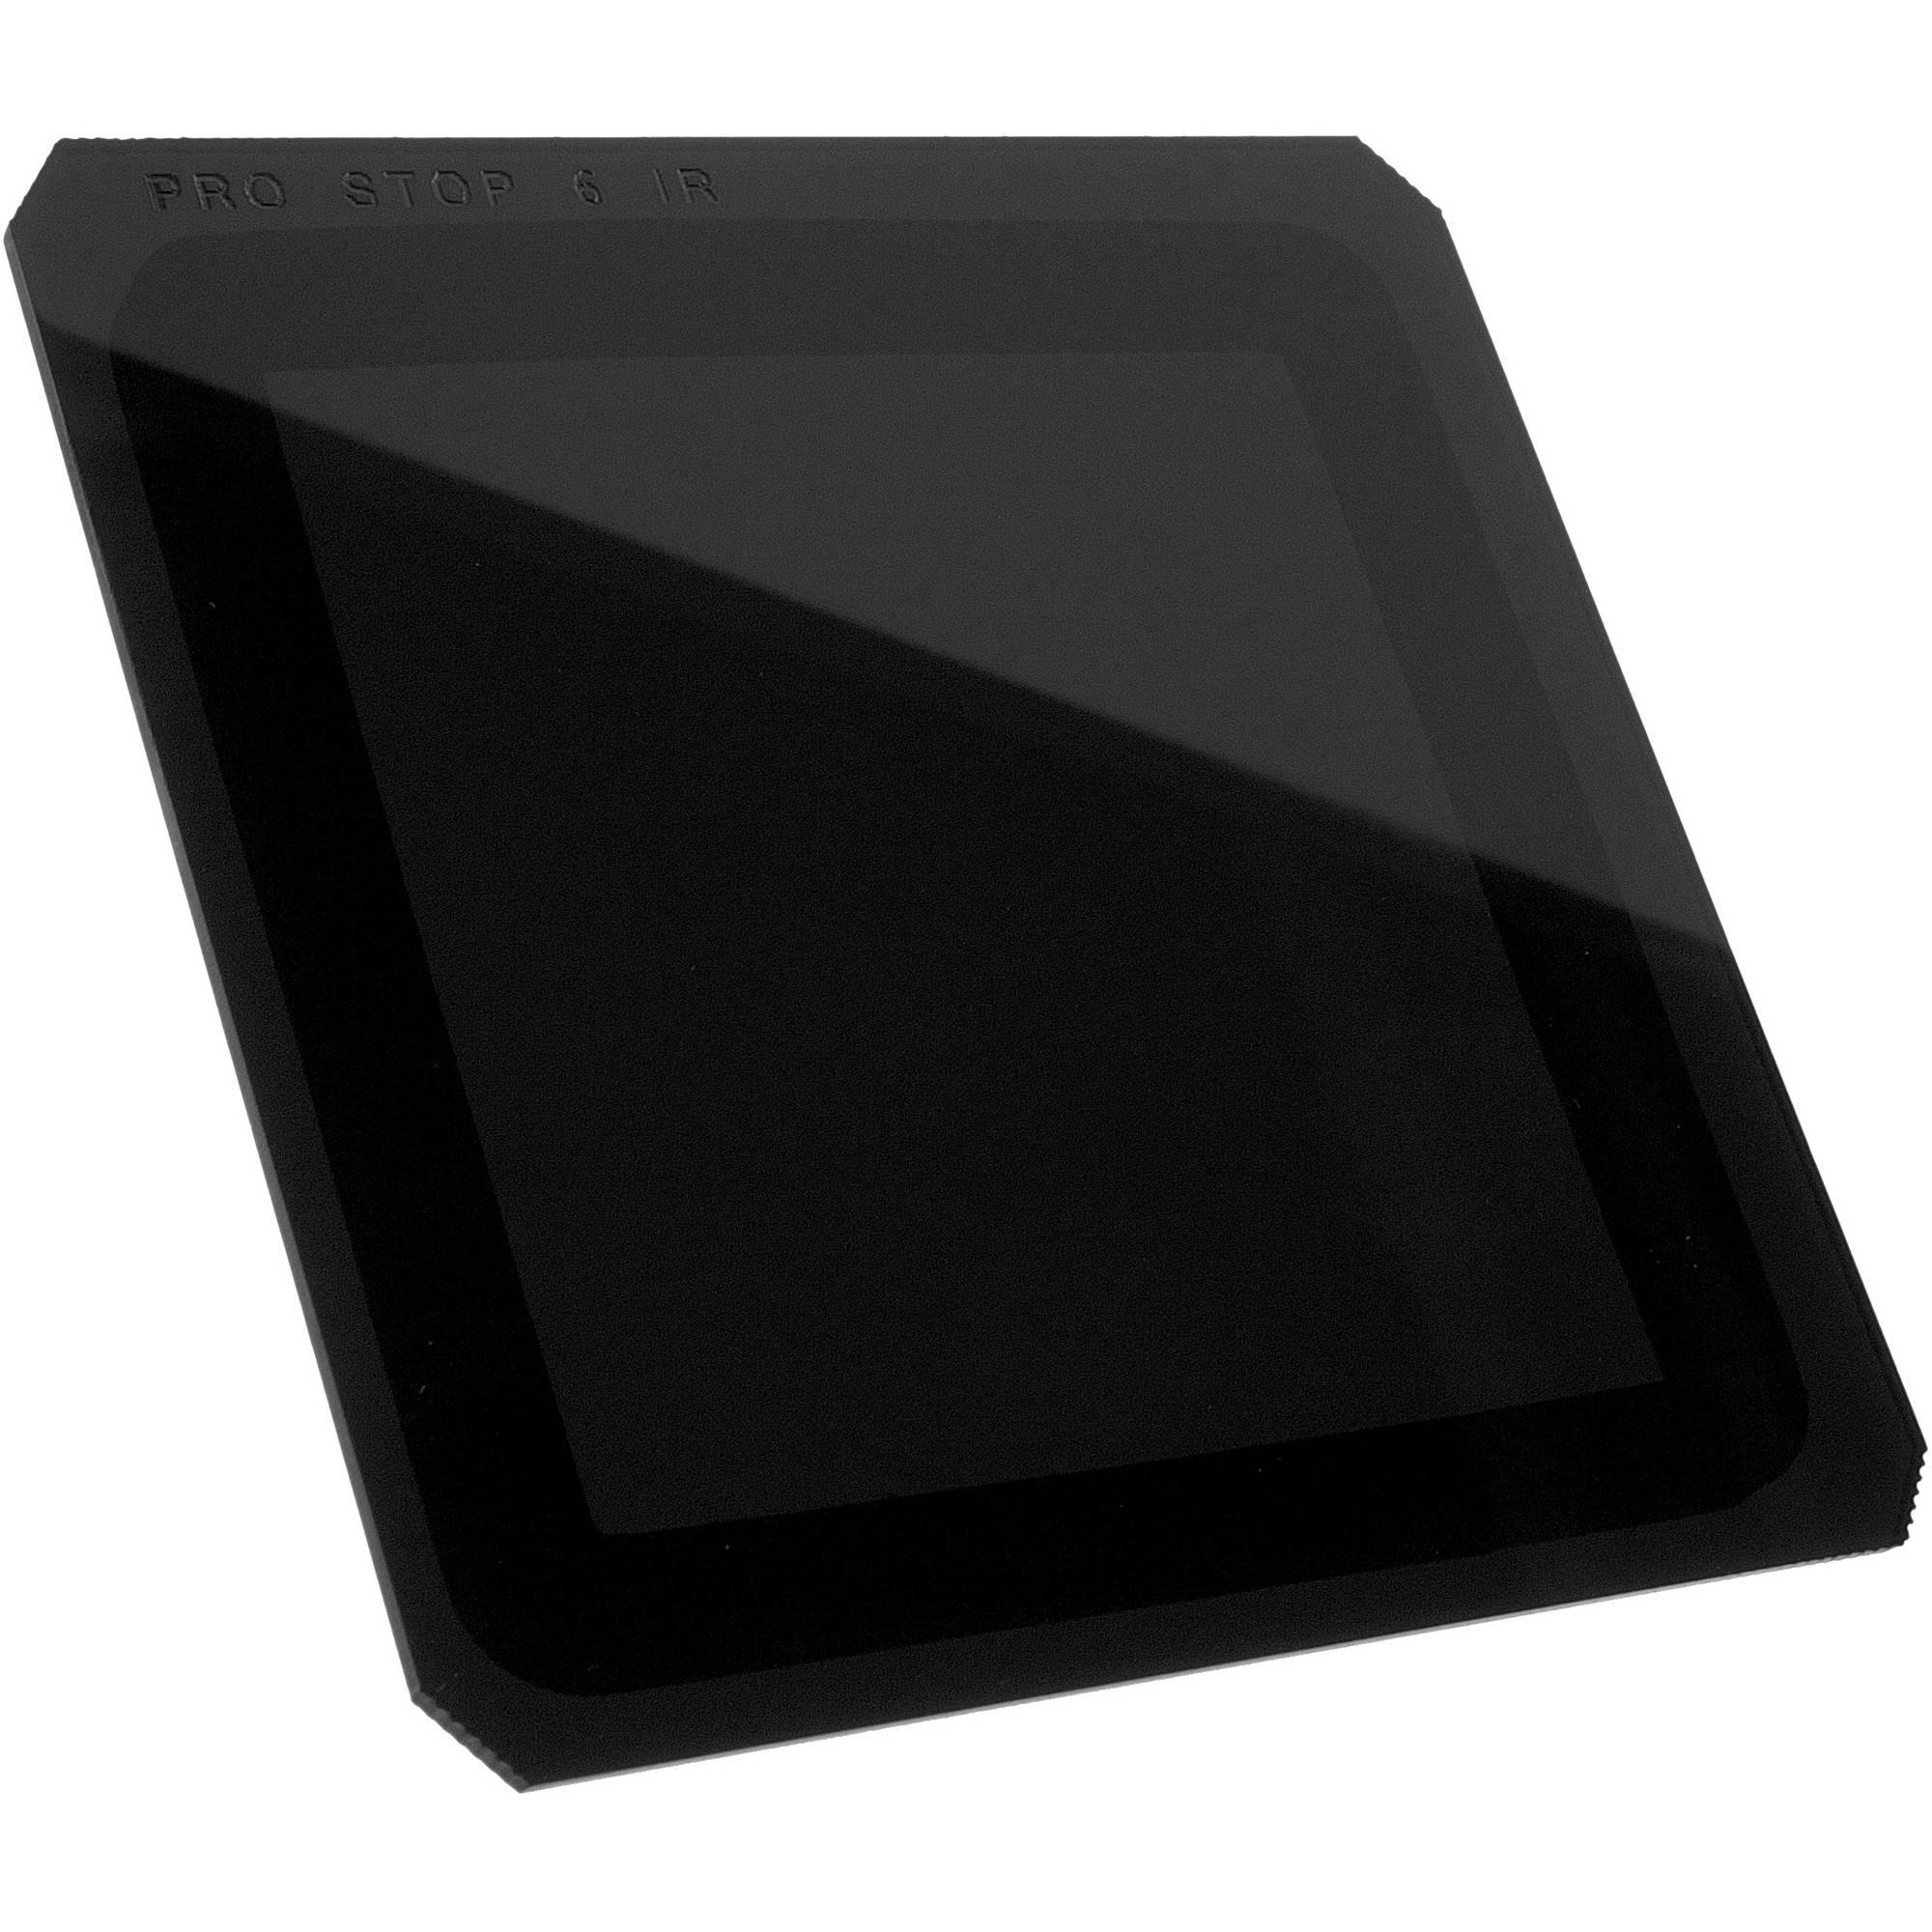 Formatt Hitech Limited HT150MMWC1 6-Inch x 6-Inch Warm Clear 1 Movie Mist Filter